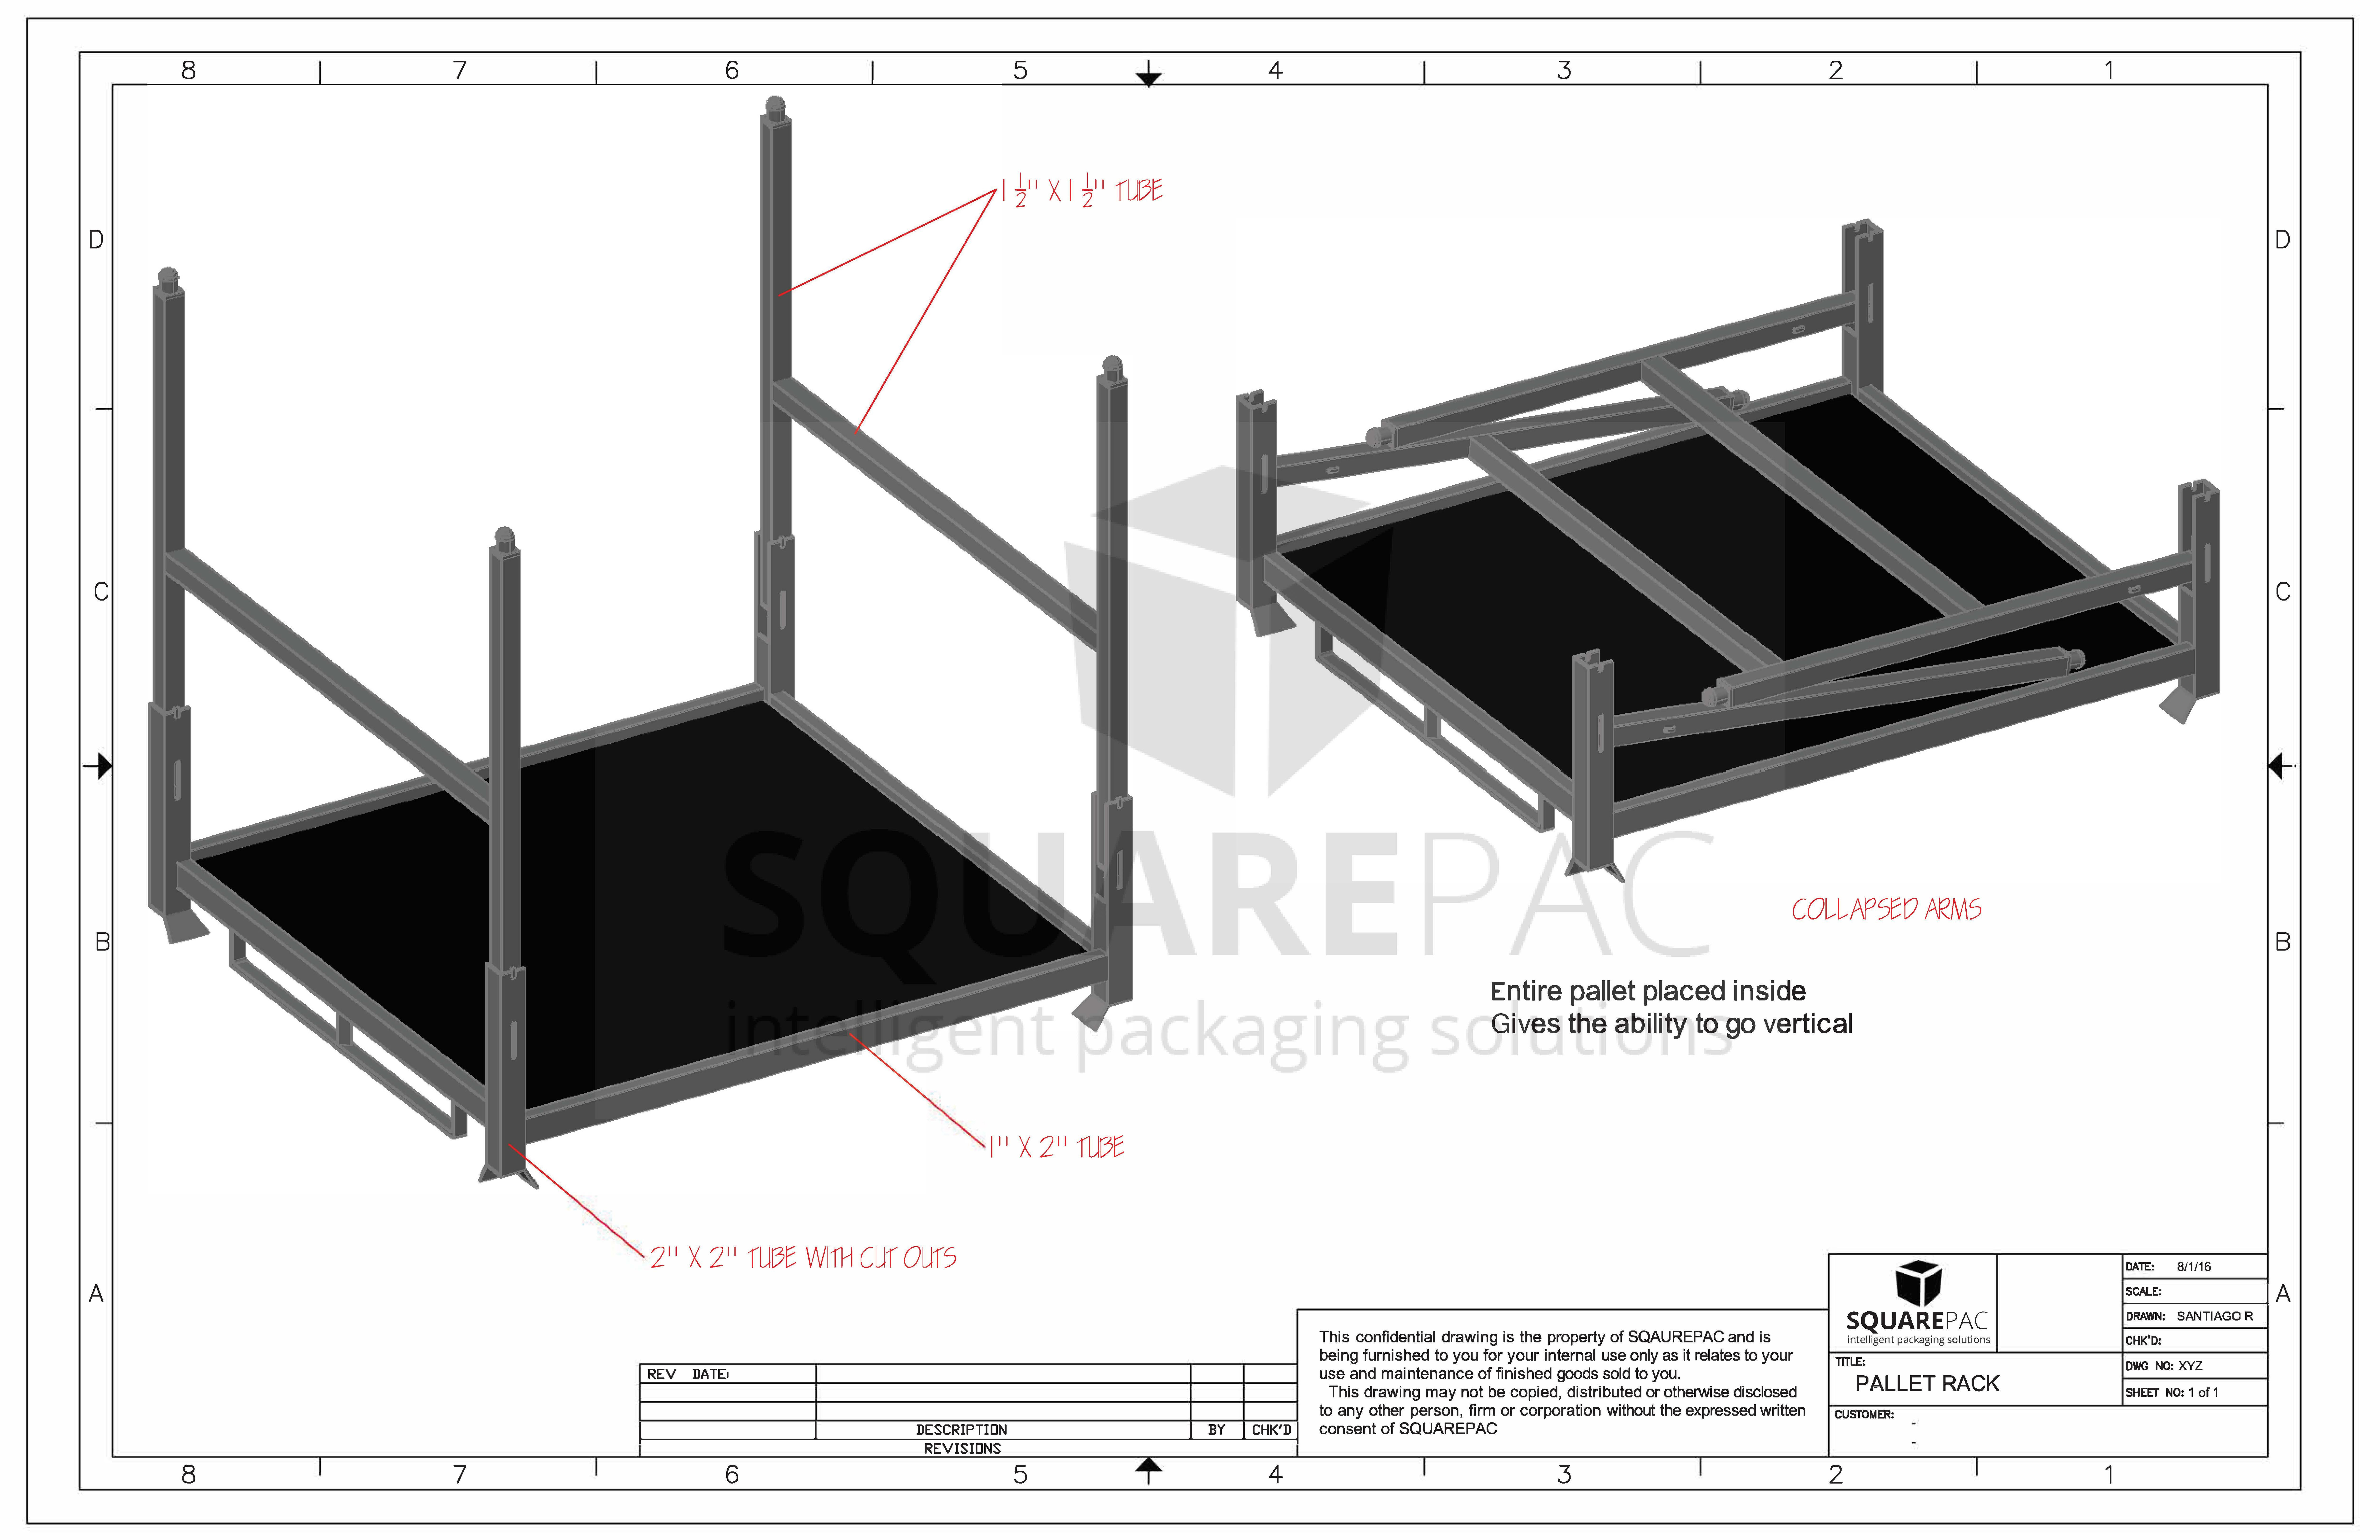 SquarePac LTD image 3